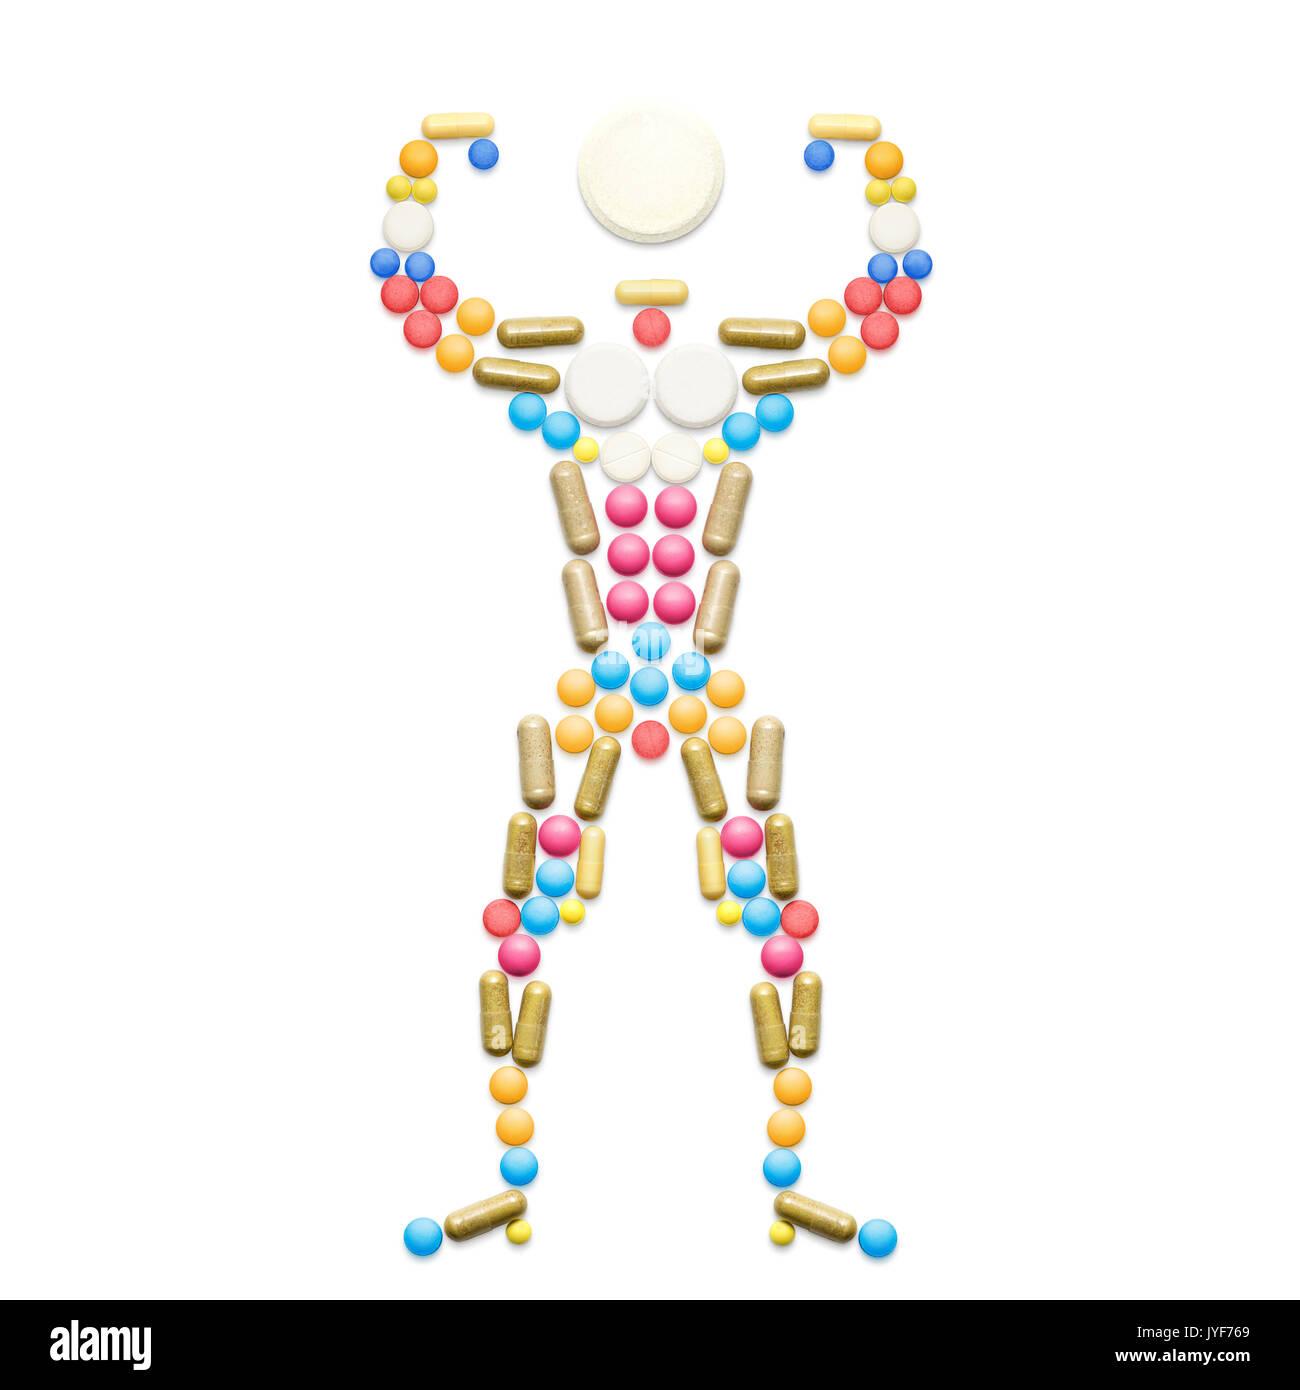 Male Hormones Stockfotos & Male Hormones Bilder - Alamy